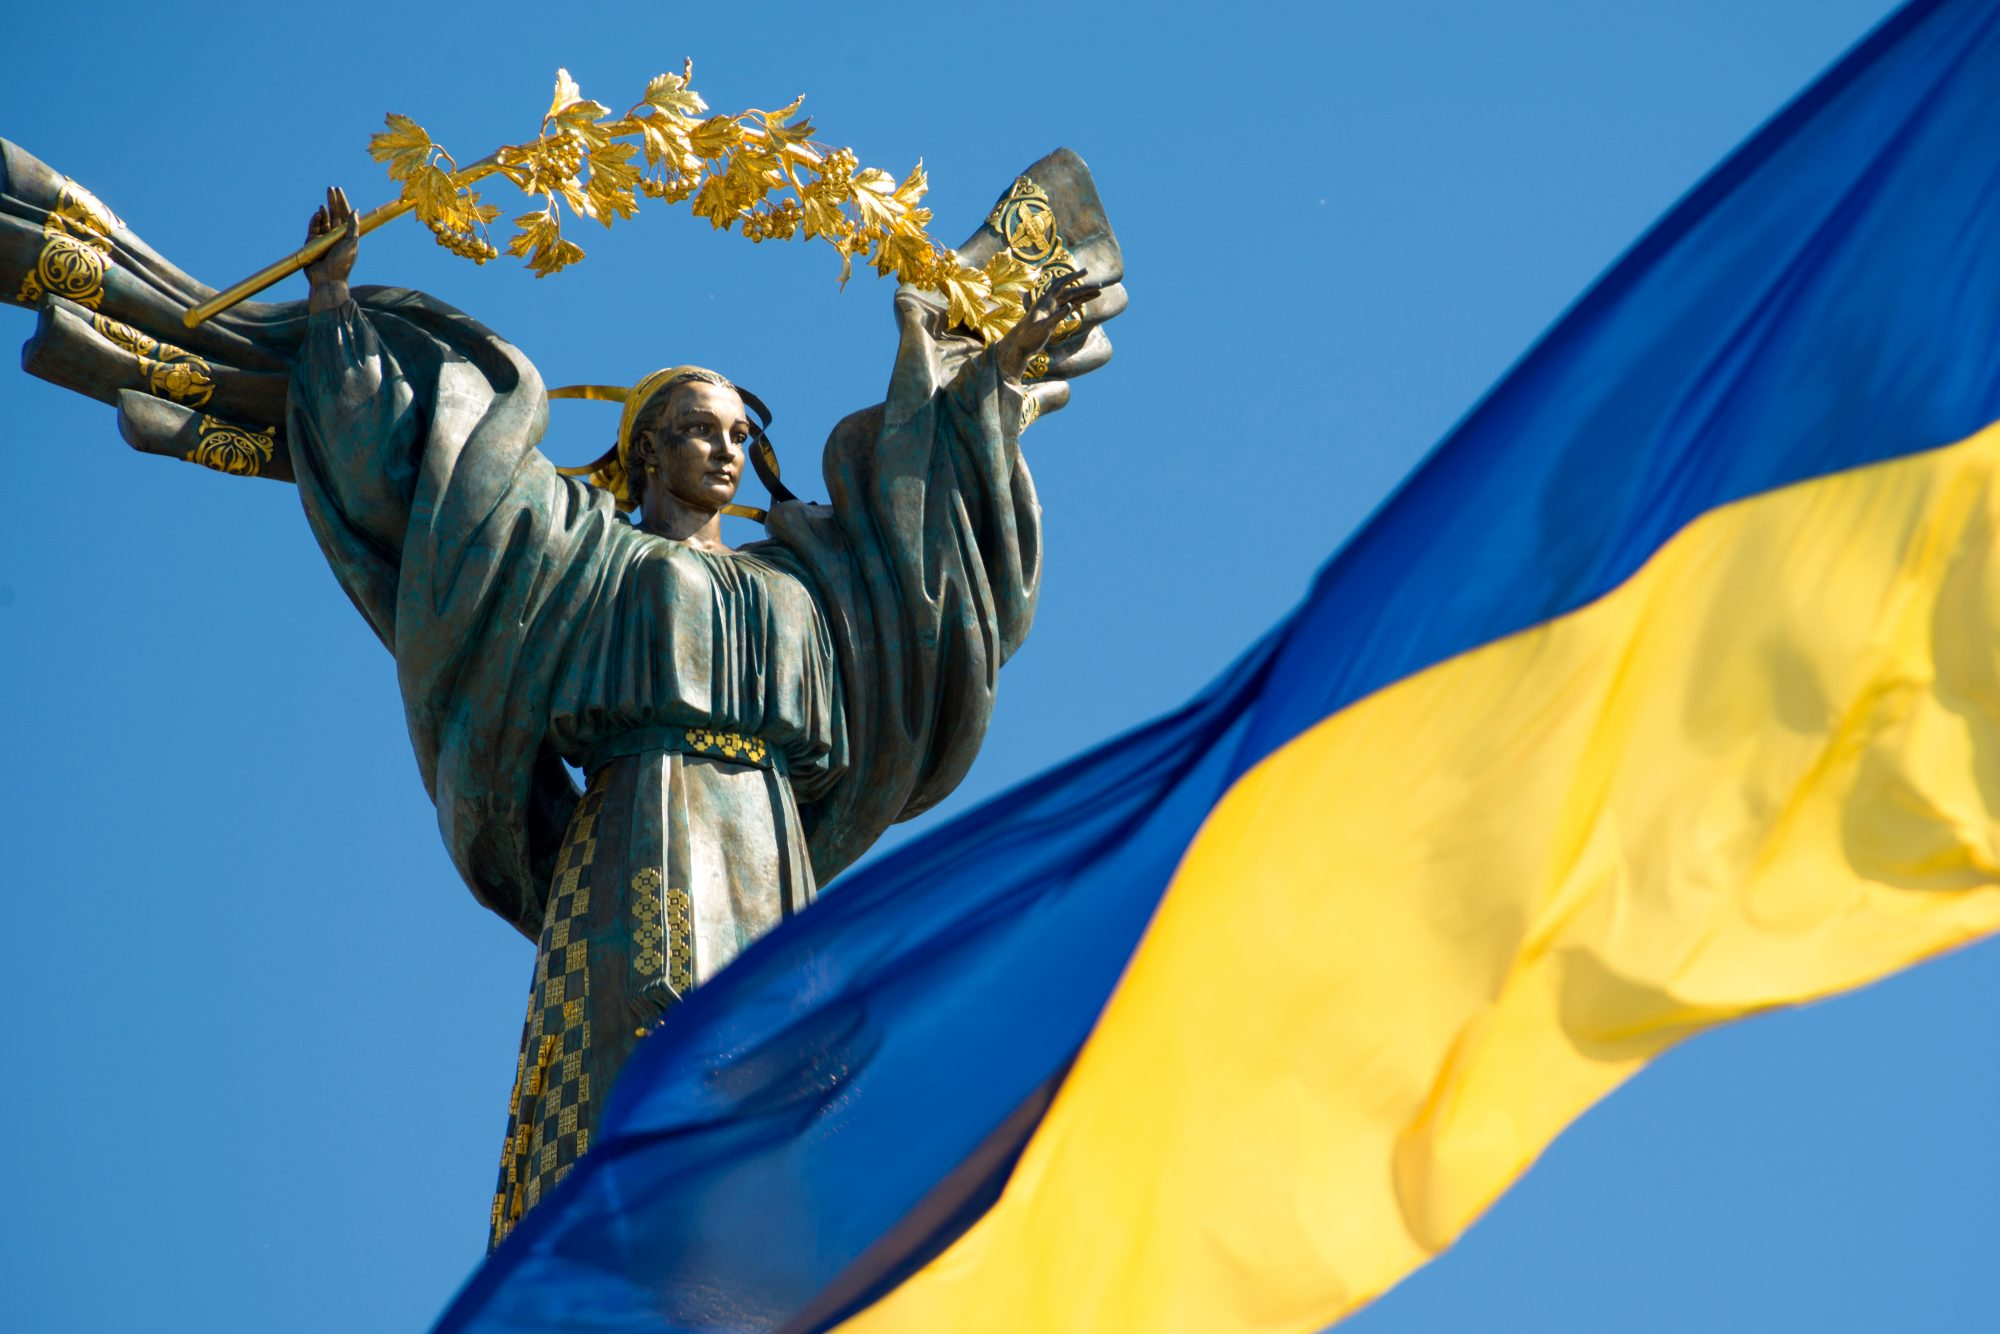 ukrayna bitcoini btc gorusmek uzere el salvadora bir heyet gonderdi